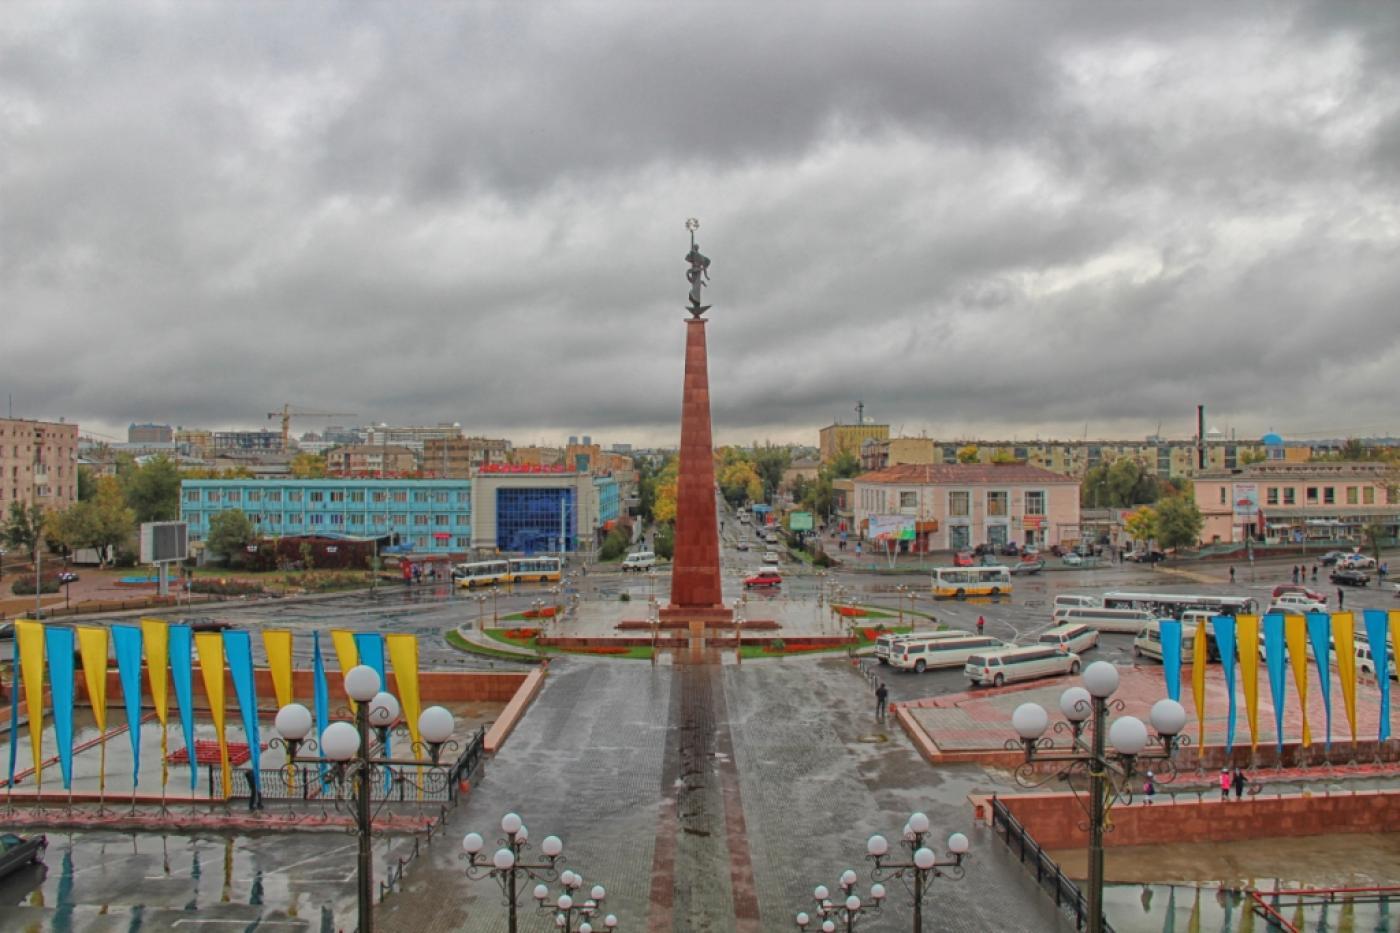 площадь Ордабасы в Шымкенте, монумент Ана Жер